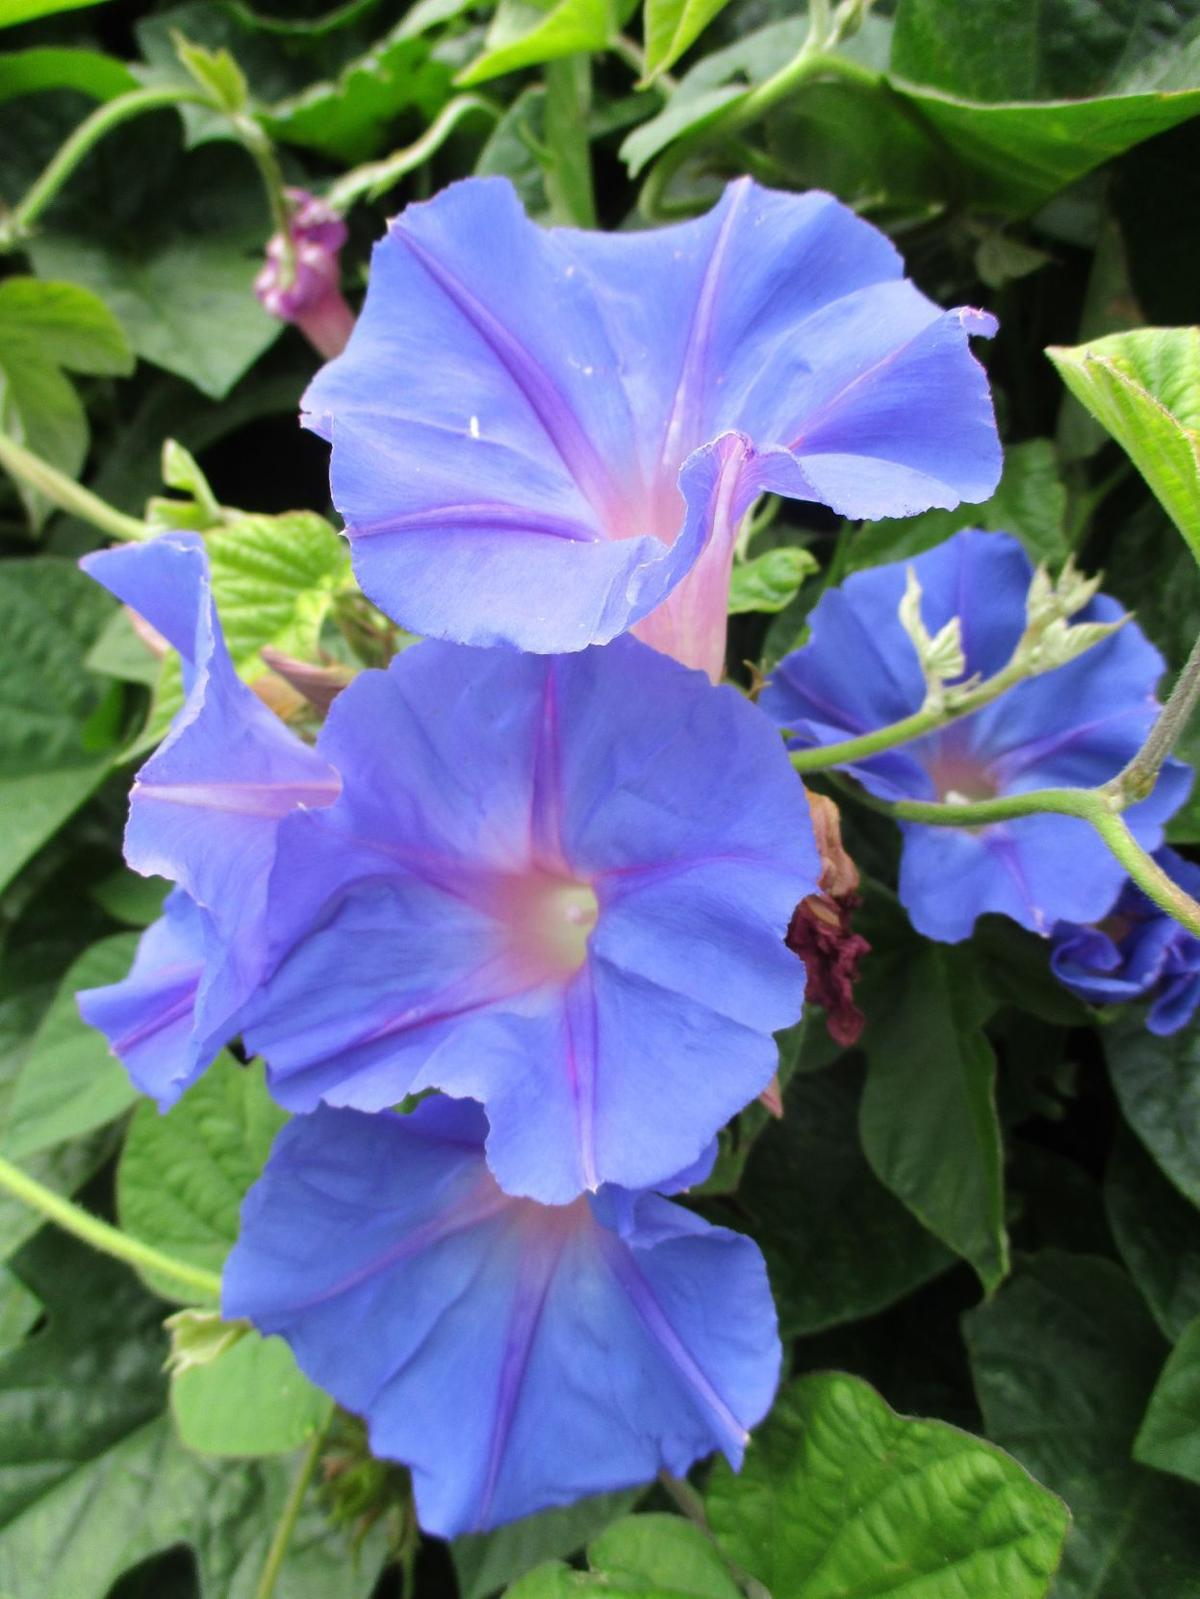 Highlight blue dawn flower home and garden lompocrecord highlight blue dawn flower izmirmasajfo Choice Image